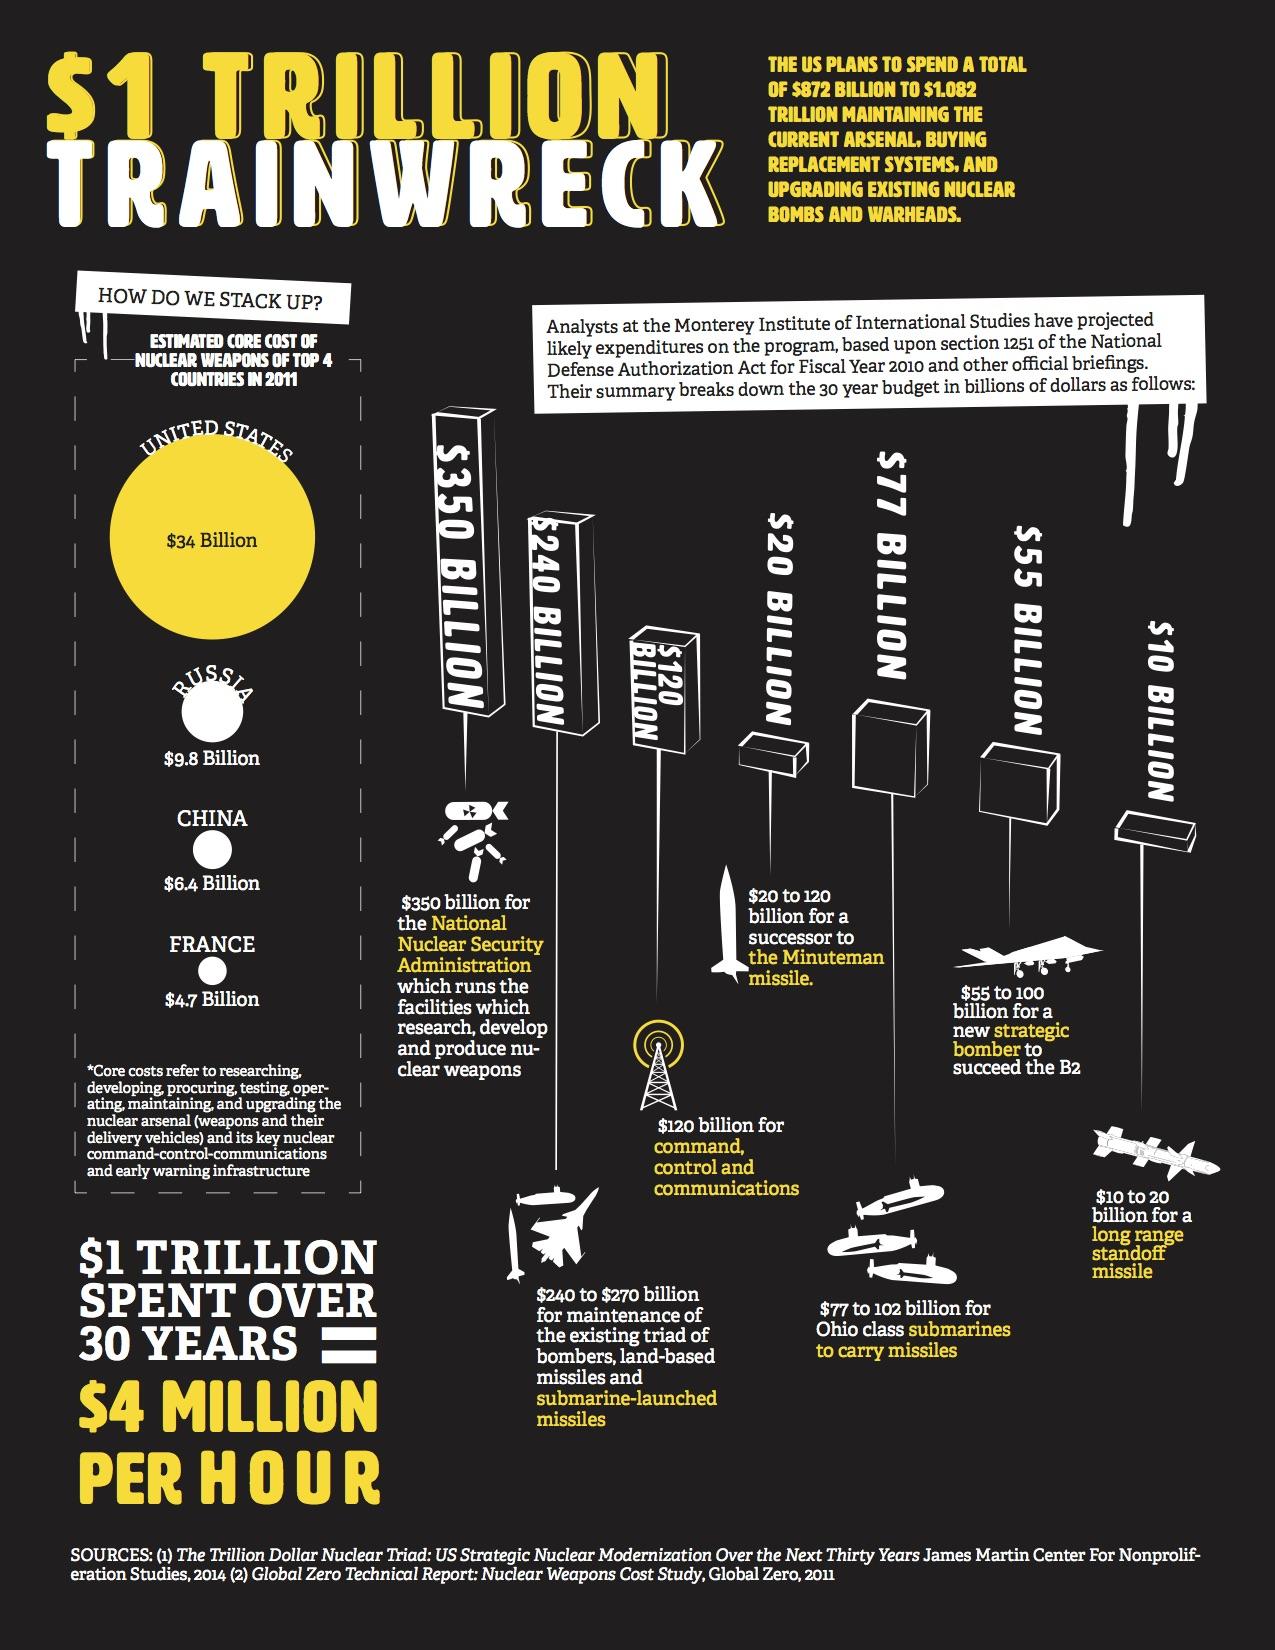 infographic-final copy.jpg